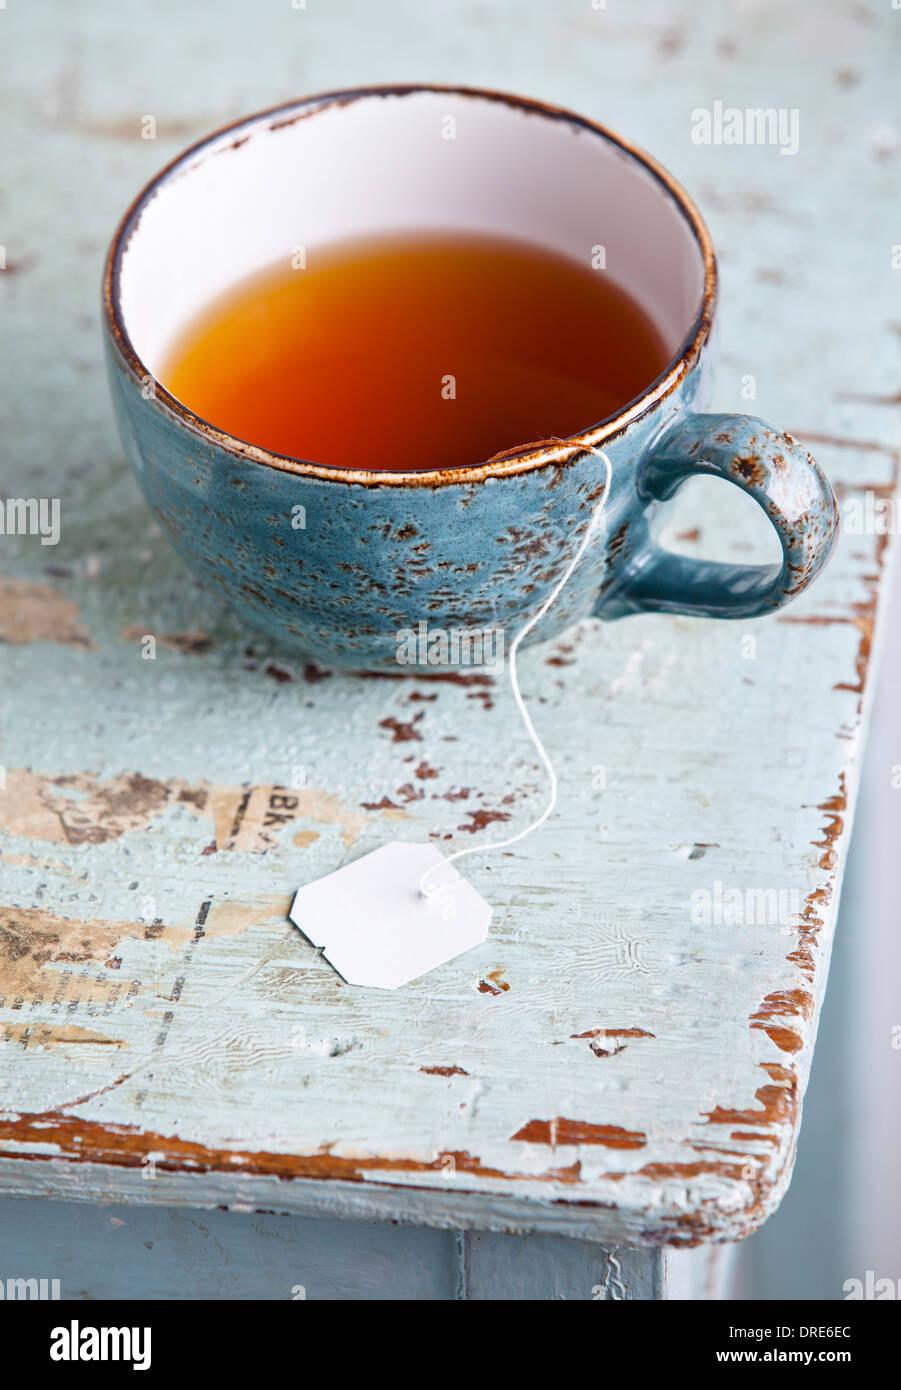 Tasse Tee mit Teebeutel auf blauem Hintergrund Textur Stockbild